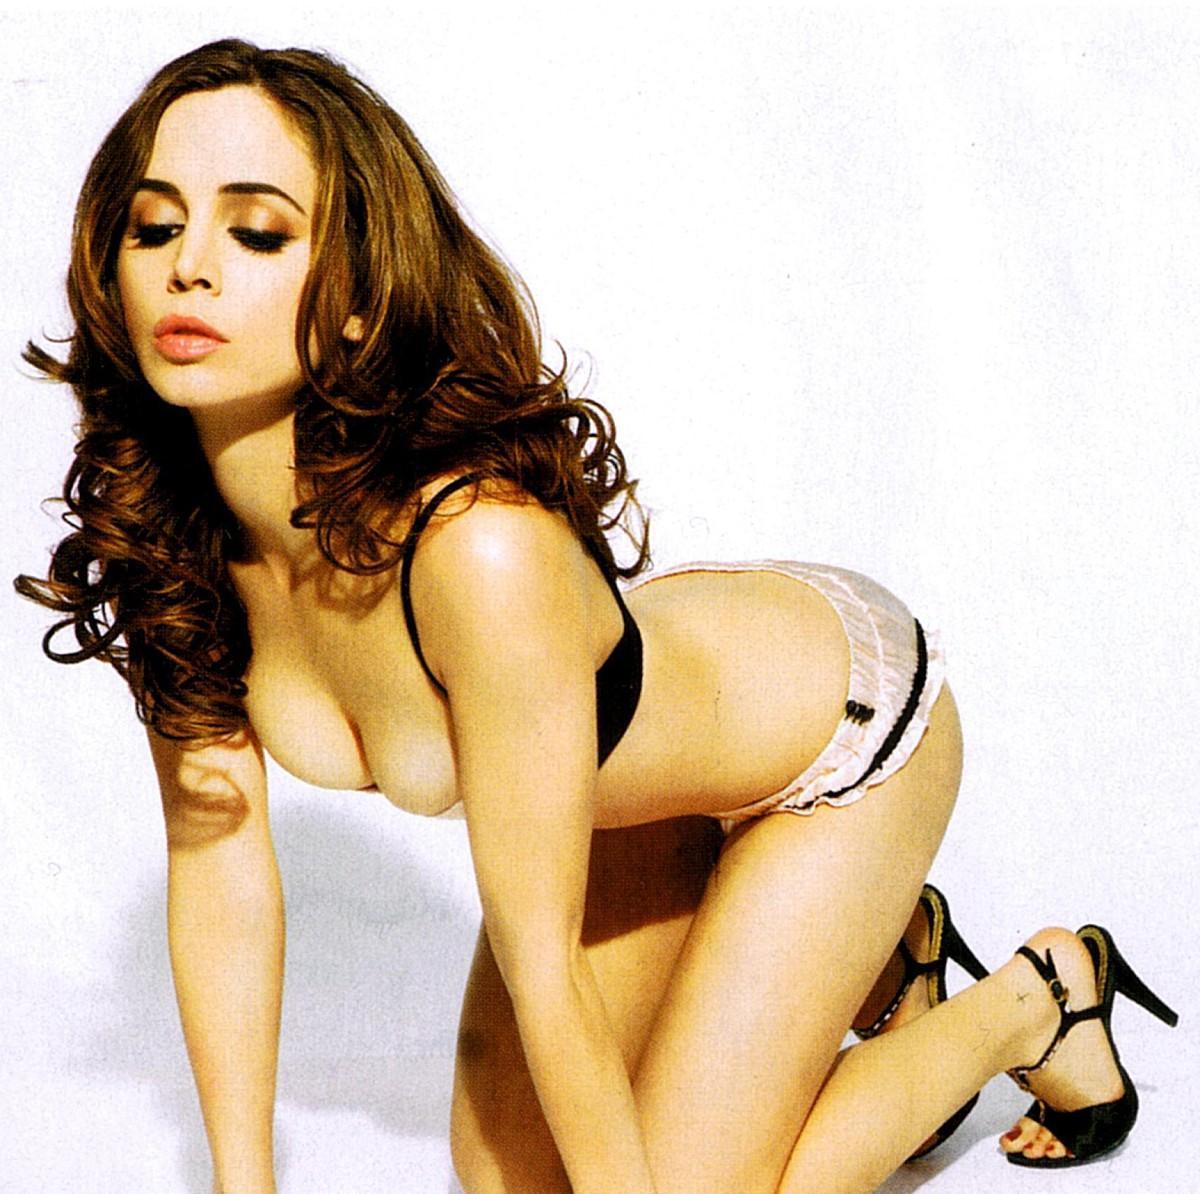 Eliza Dushku fotos desnuda hackeadas 1